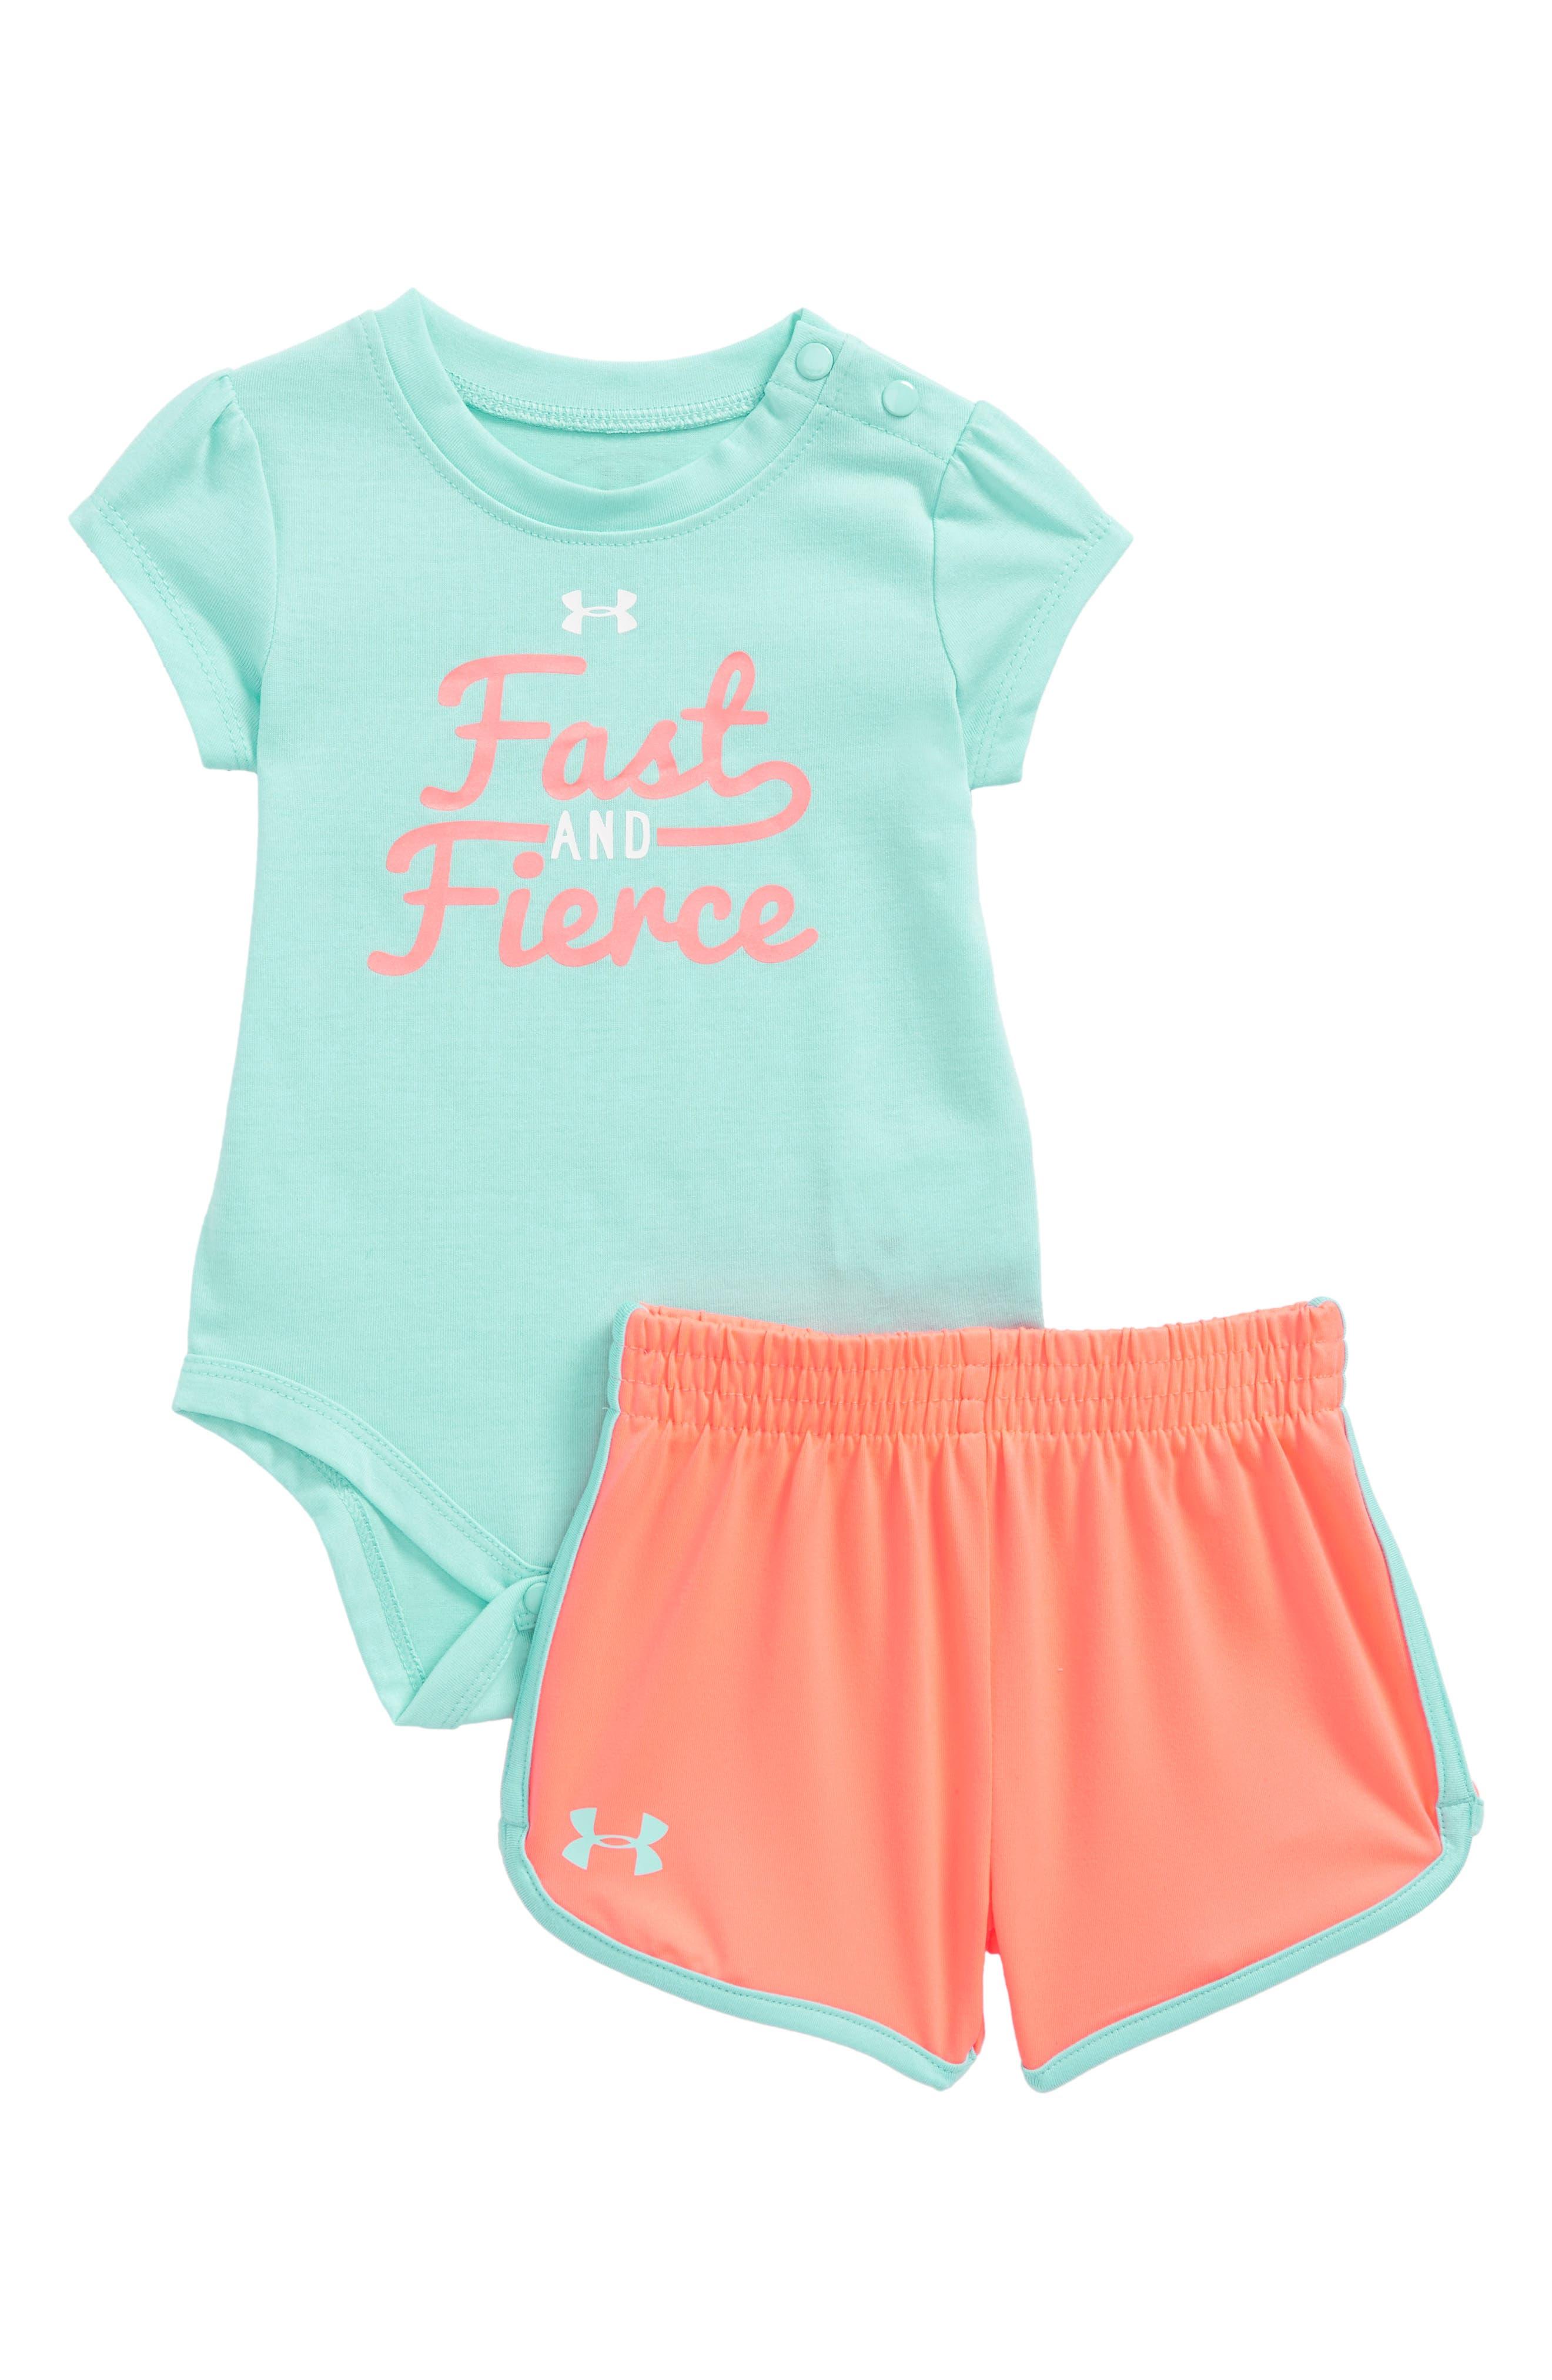 Fast & Fierce Bodysuit & Shorts Set,                             Main thumbnail 1, color,                             410